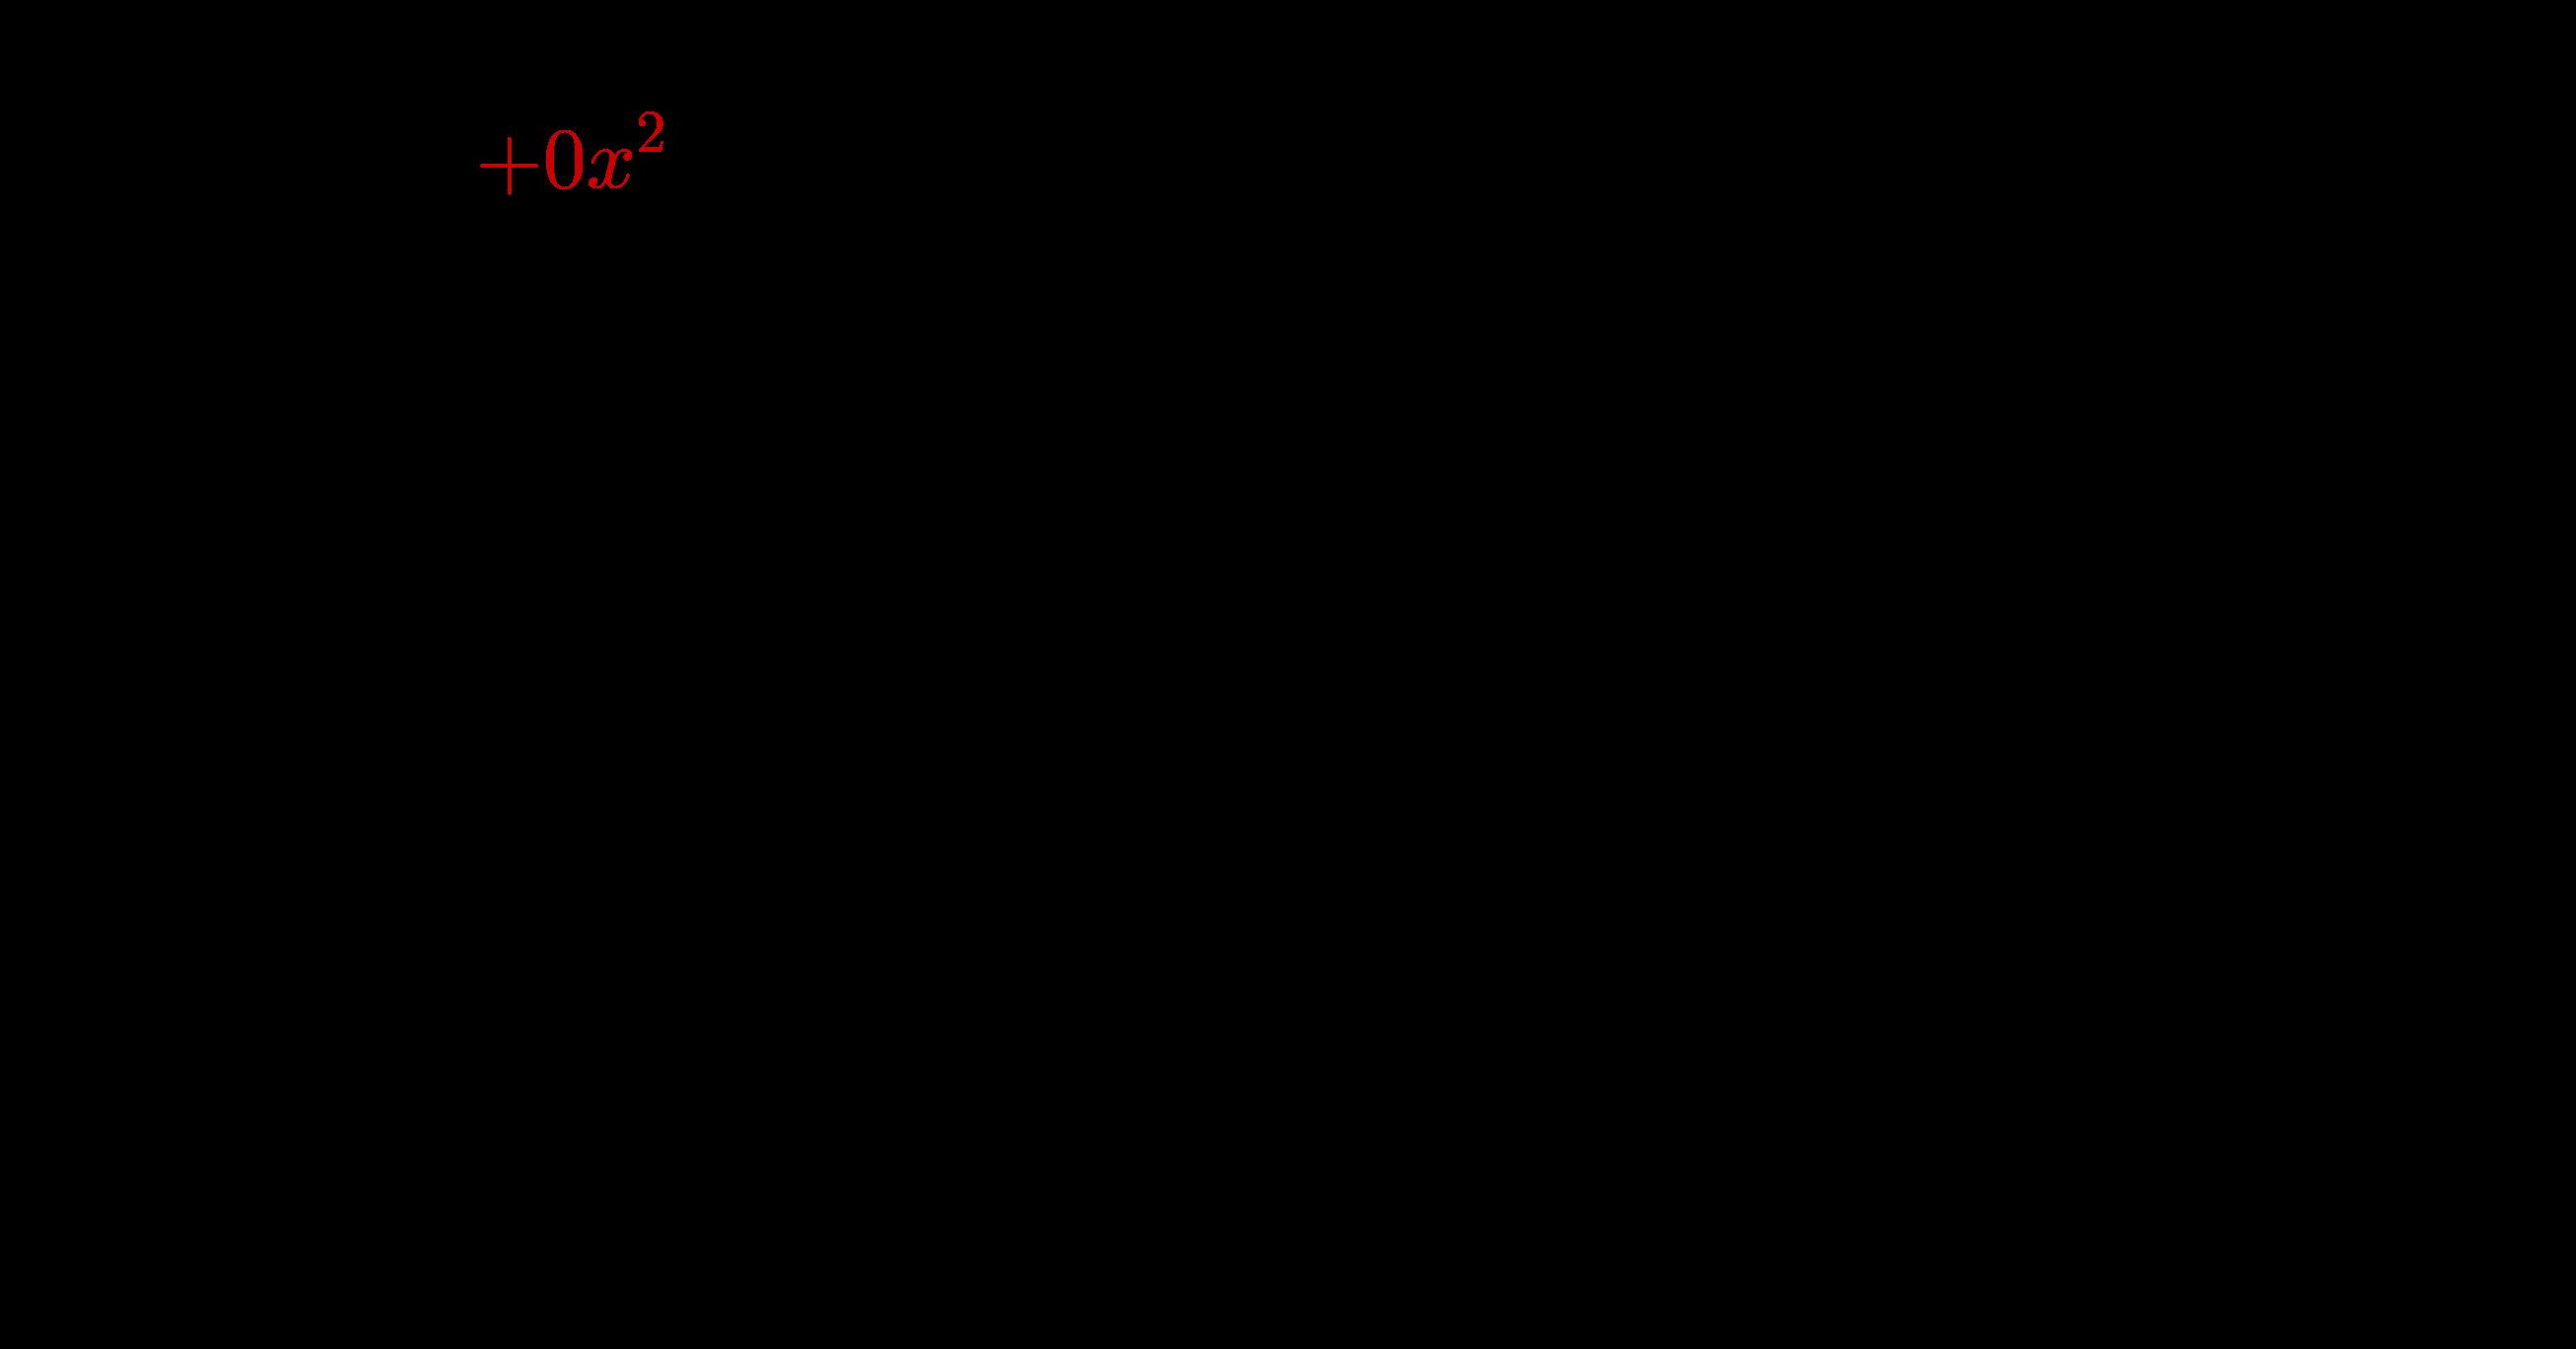 Polynomdivision mit fehlendem Exponenten